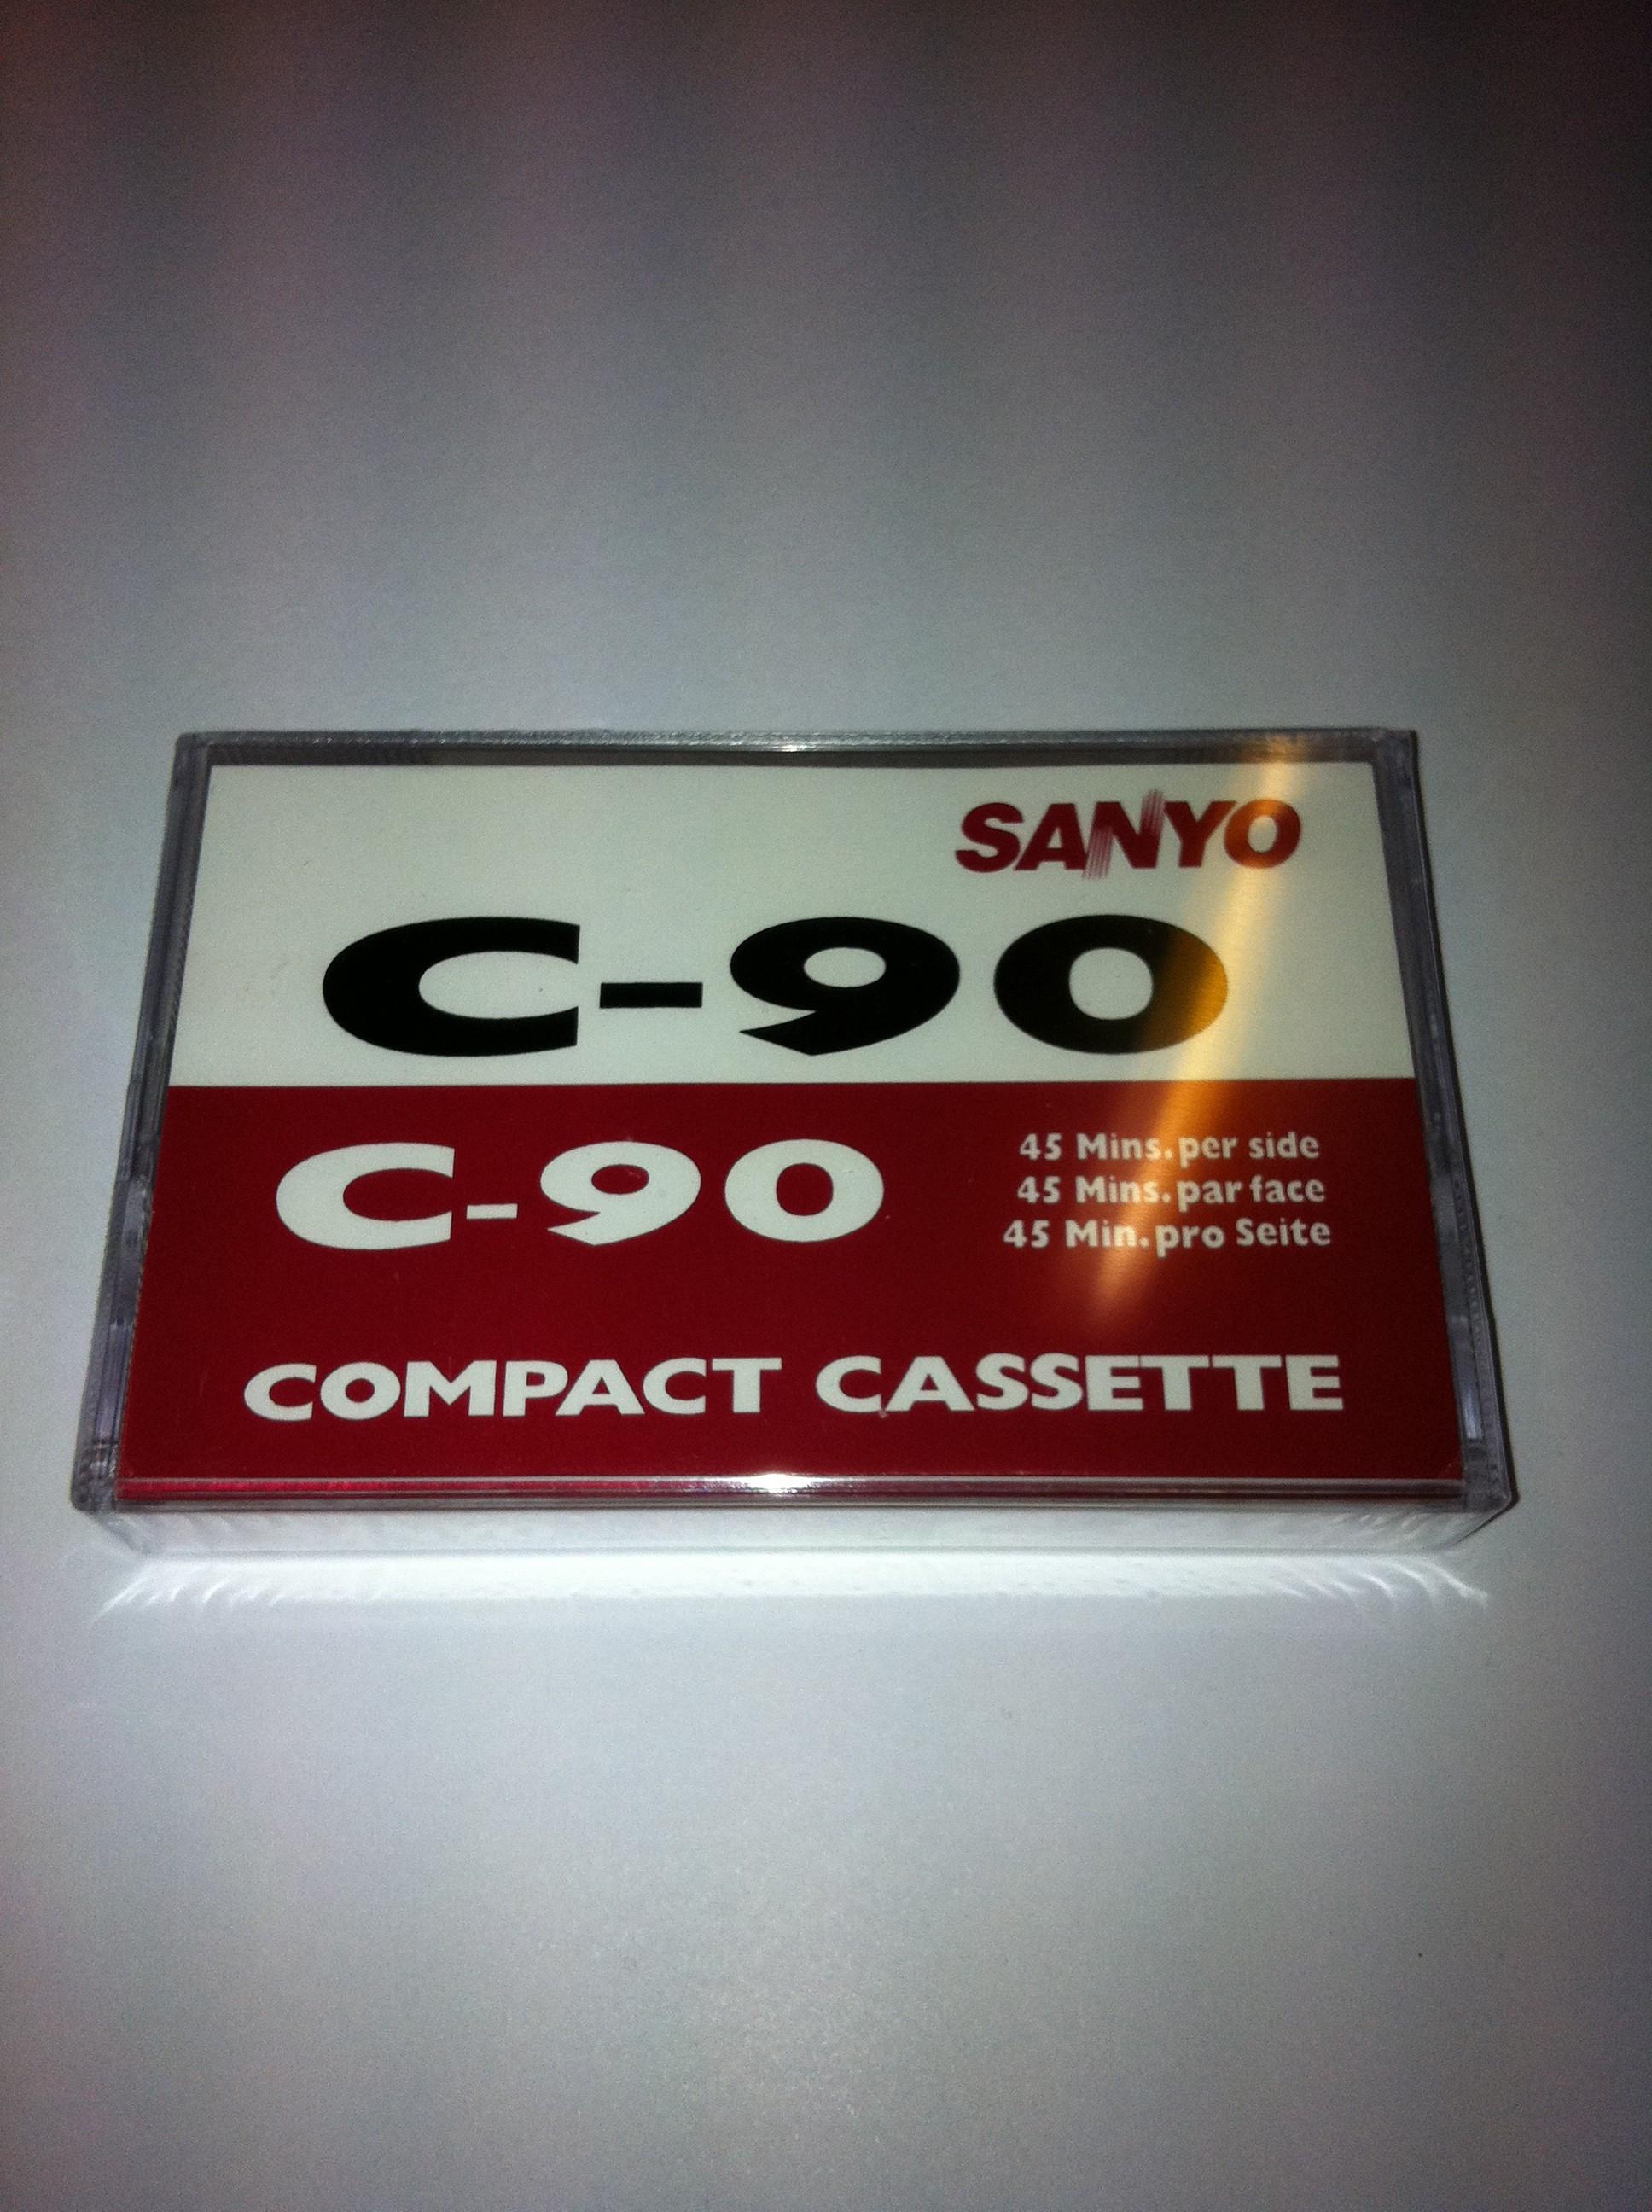 Sanyo C-90 Compact casssette 2 x 45 minutter